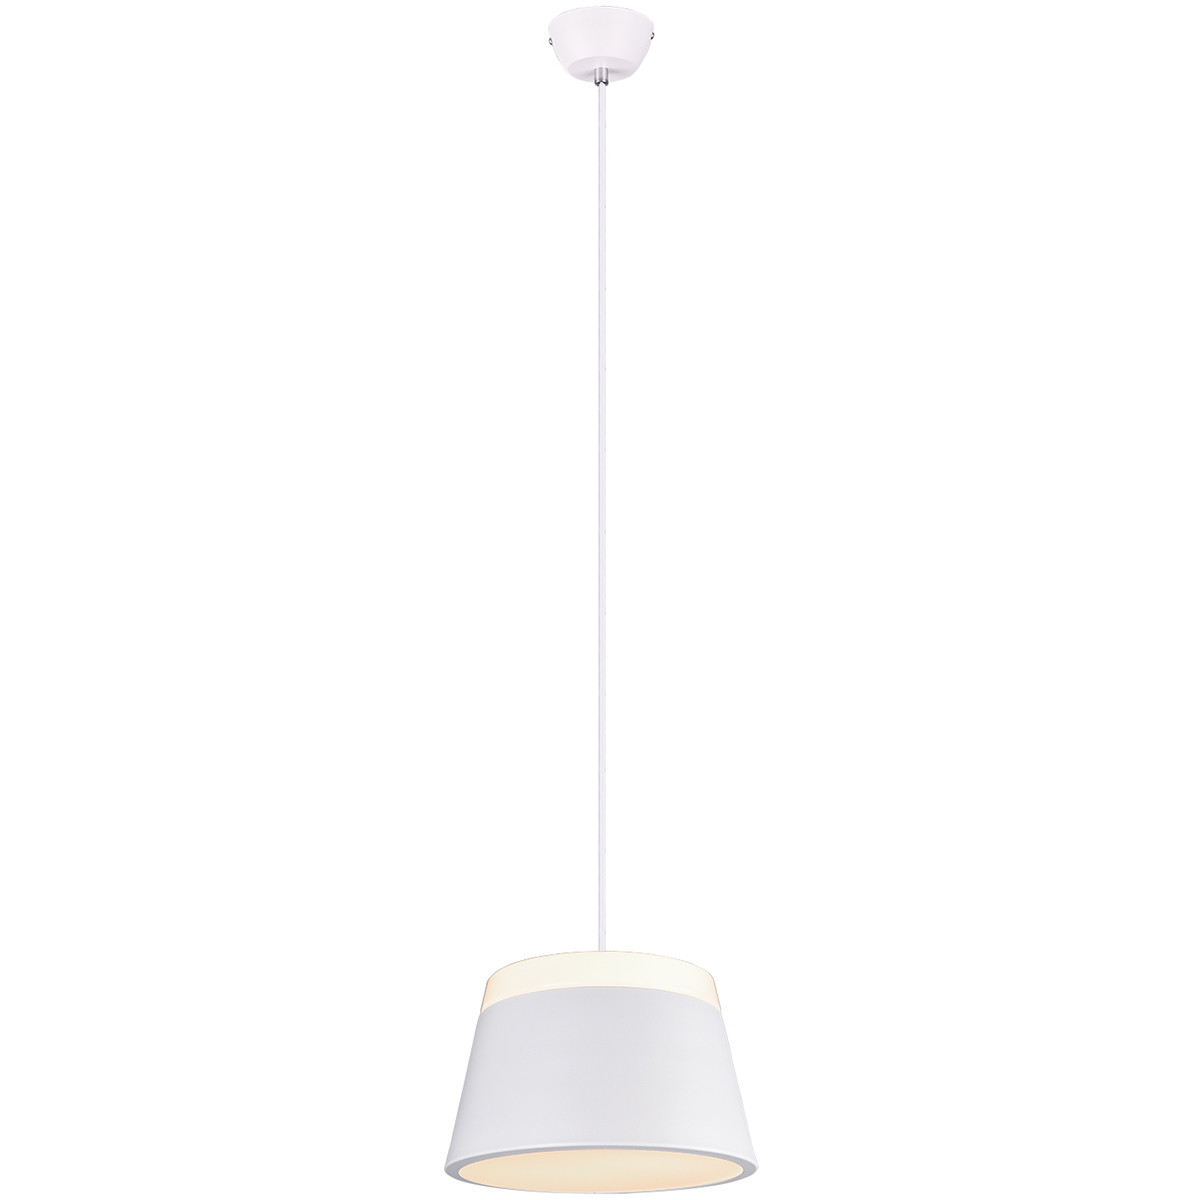 LED Hanglamp - Trion Barnaness - E27 Fitting - 2-lichts - Rond - Mat Wit - Aluminium